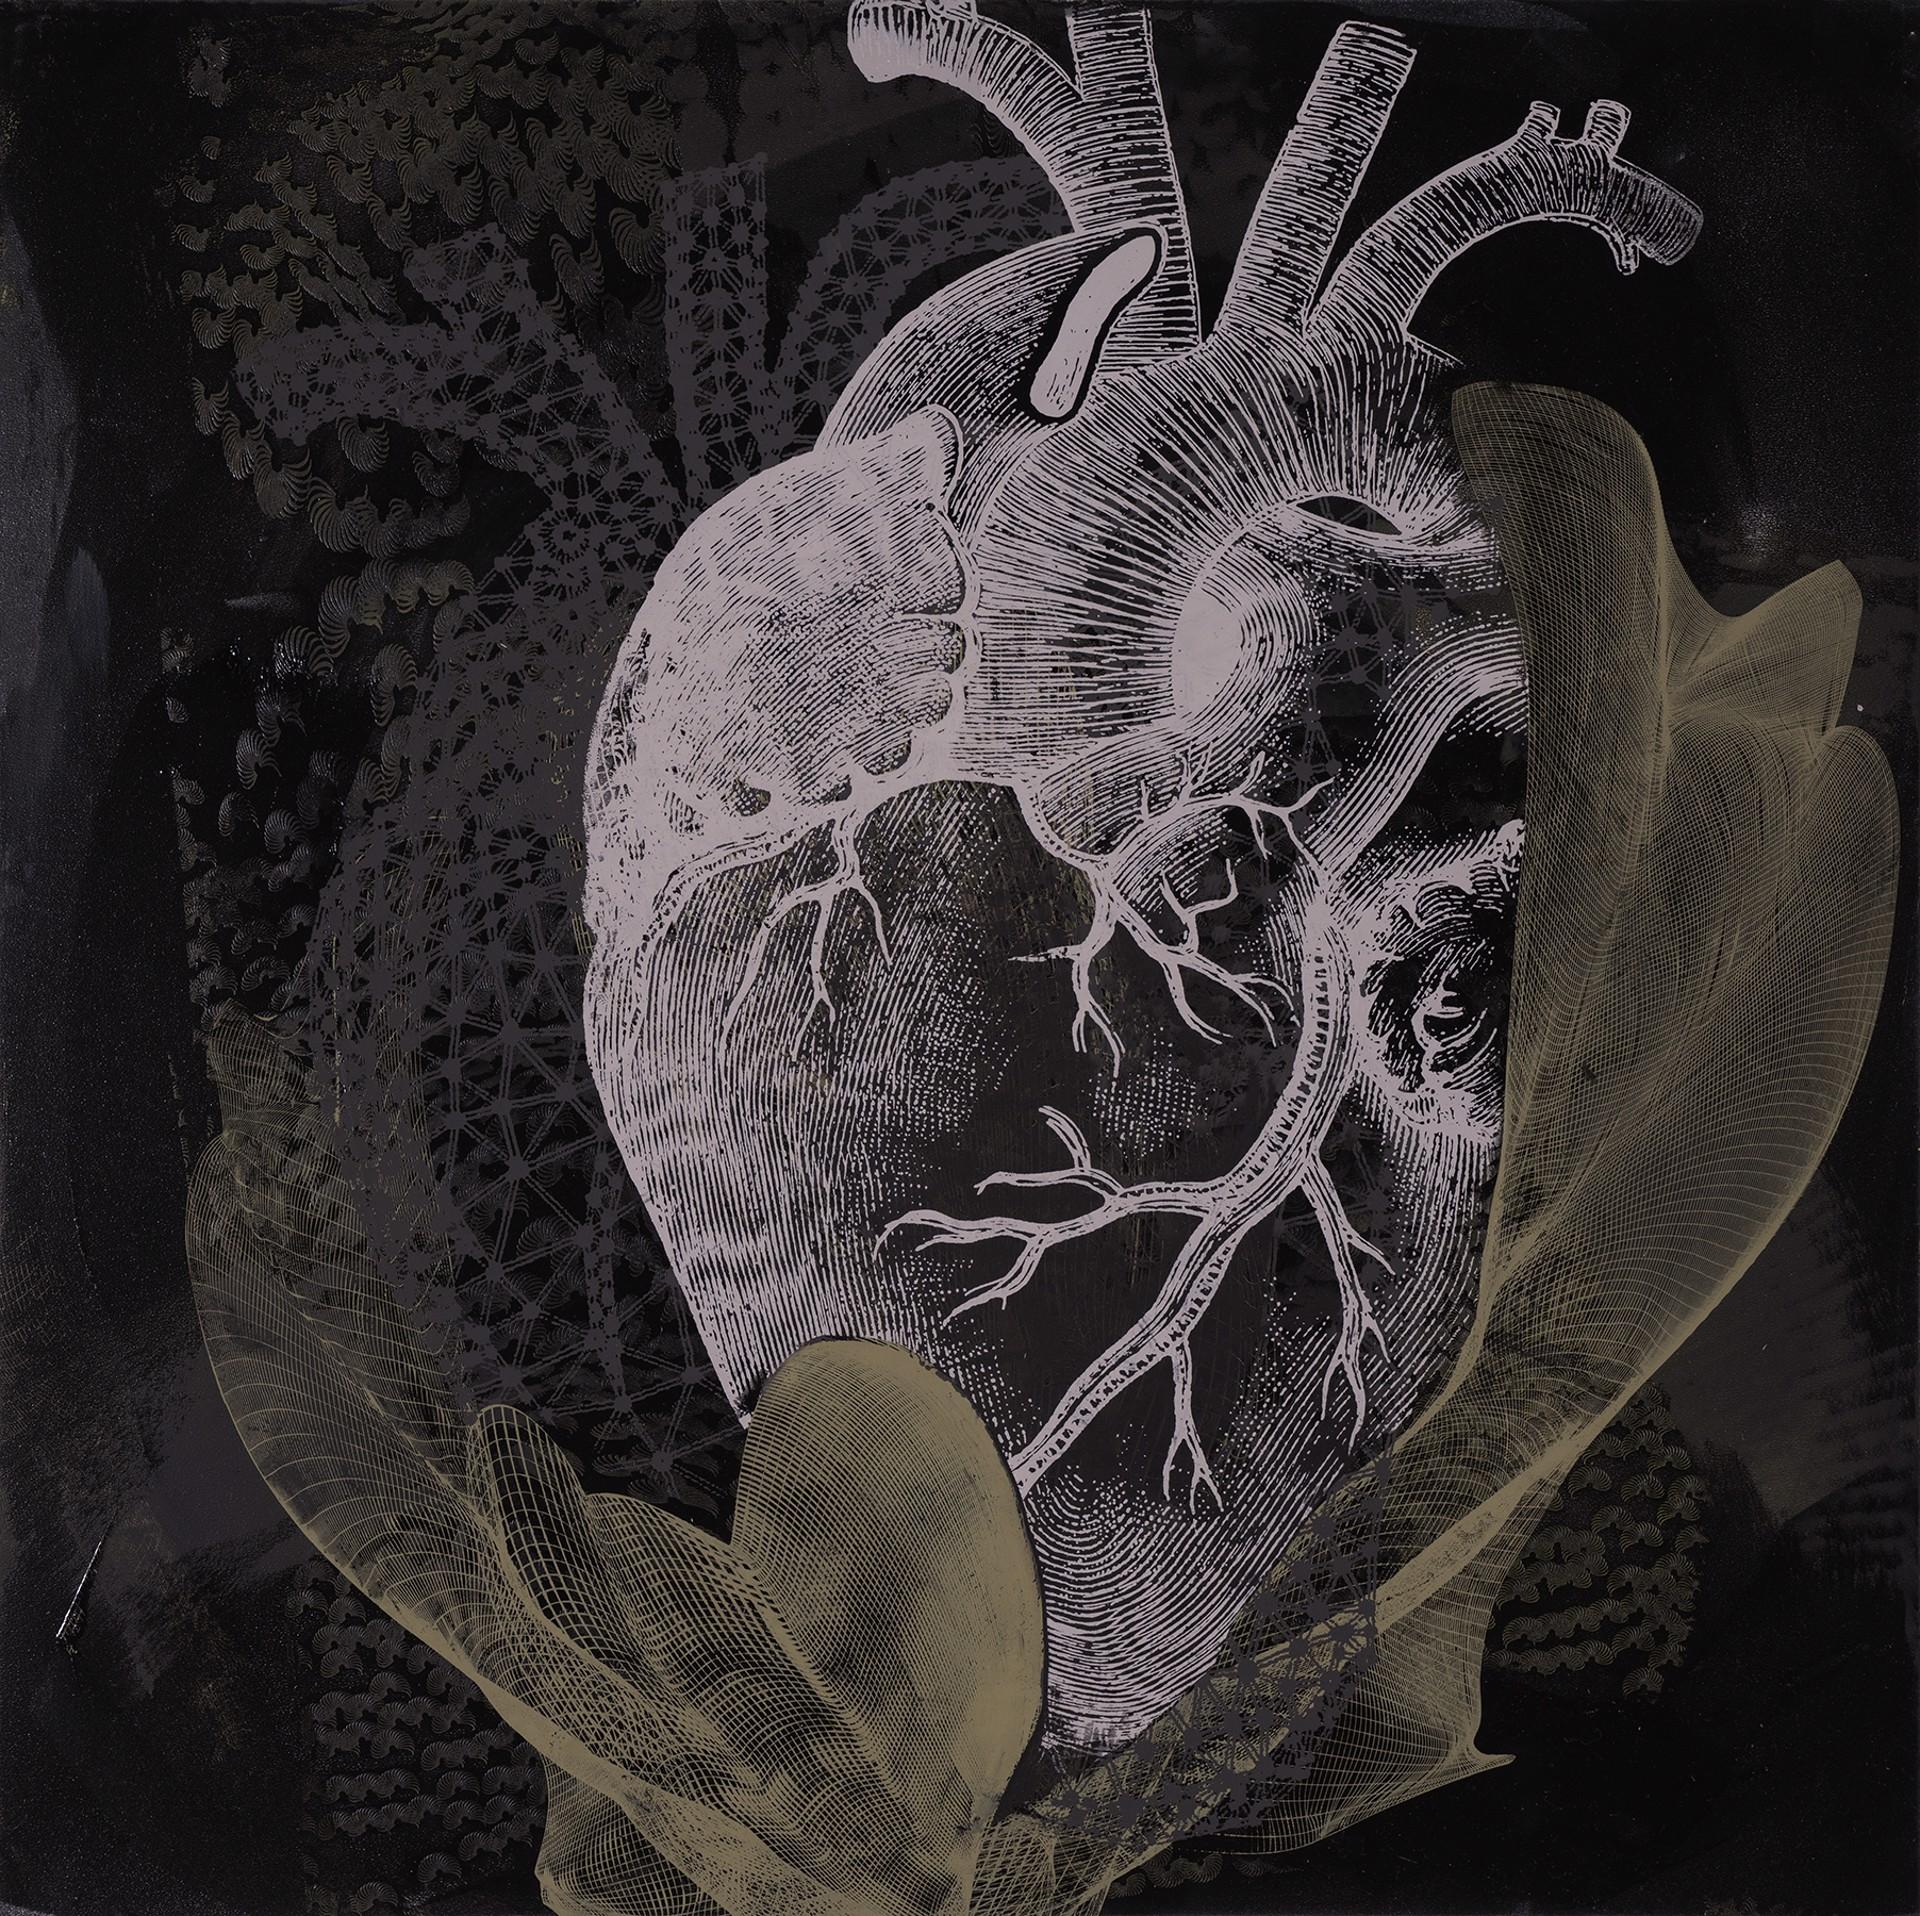 Hatched Heart by Dorothea Van Camp